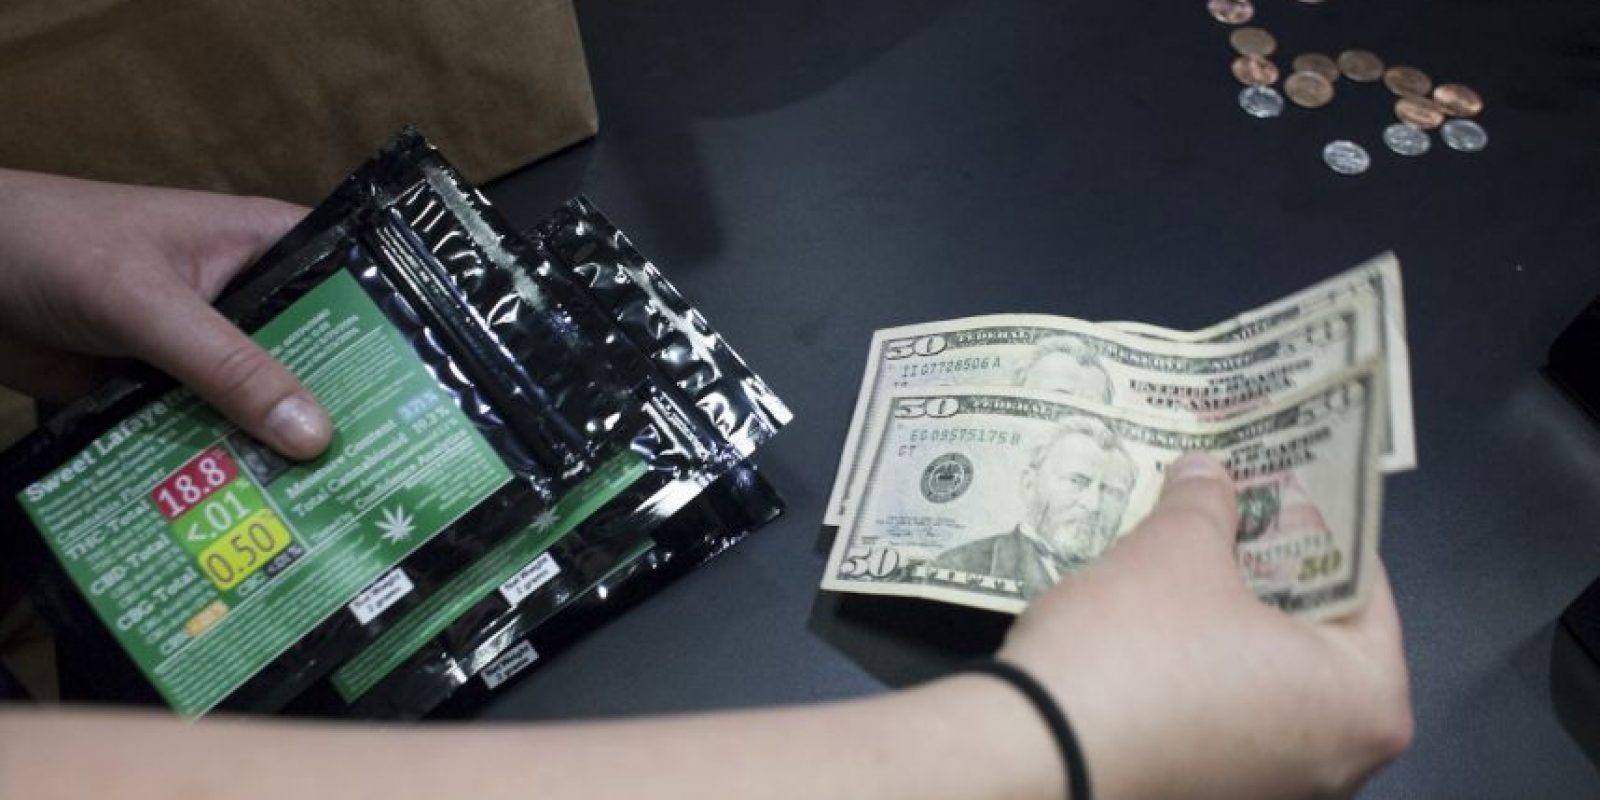 En 2012, HSBC decidió pagar una histórica multa que ascendió a mil 900 millones de dólares por lavar dinero de cárteles de droga mexicanos. Foto:Getty Images